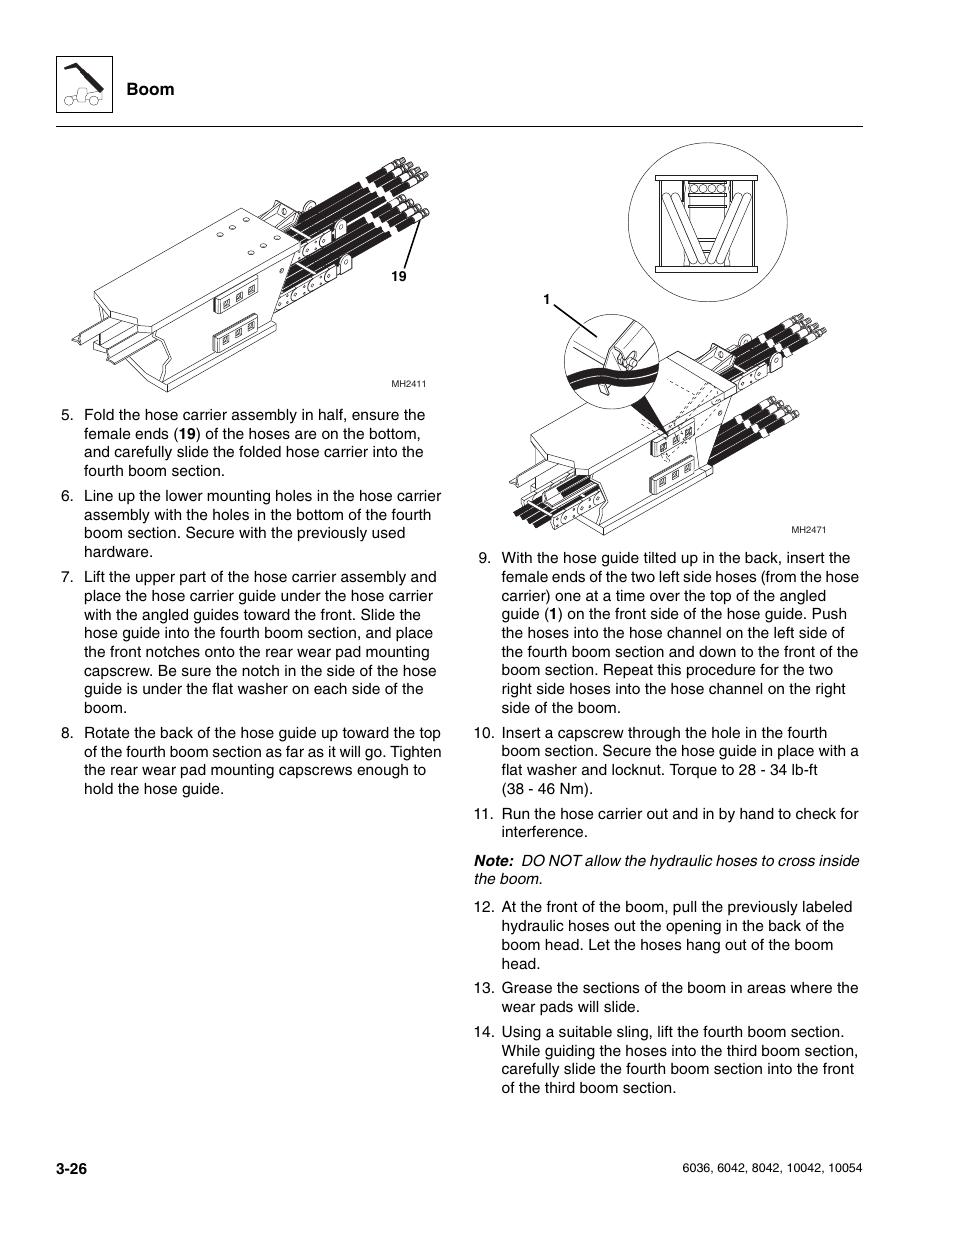 Skytrak 6036 Service Manual User Manual